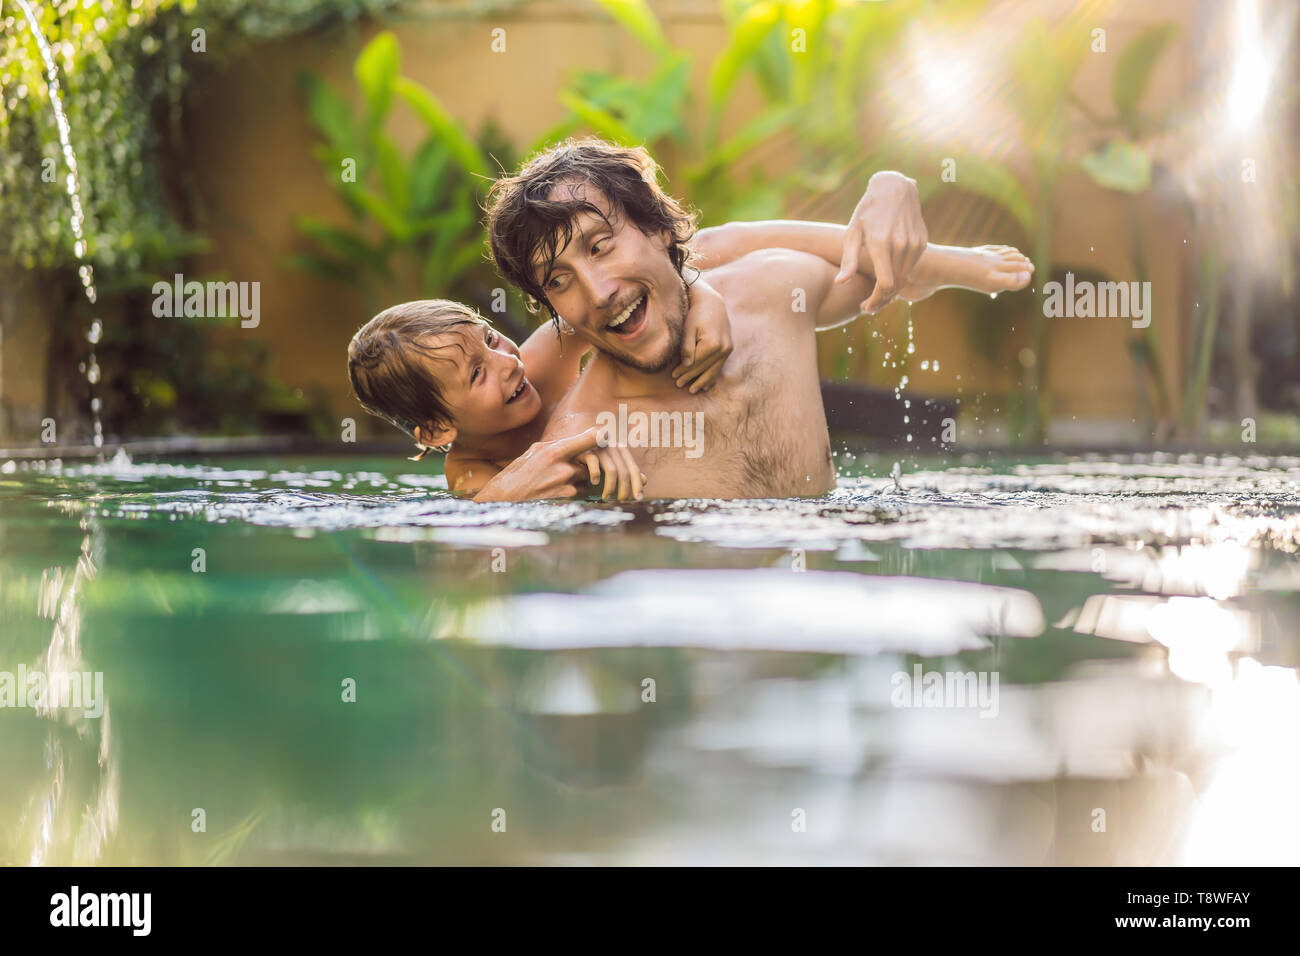 Padre e hijo se divierten en la piscina Foto de stock